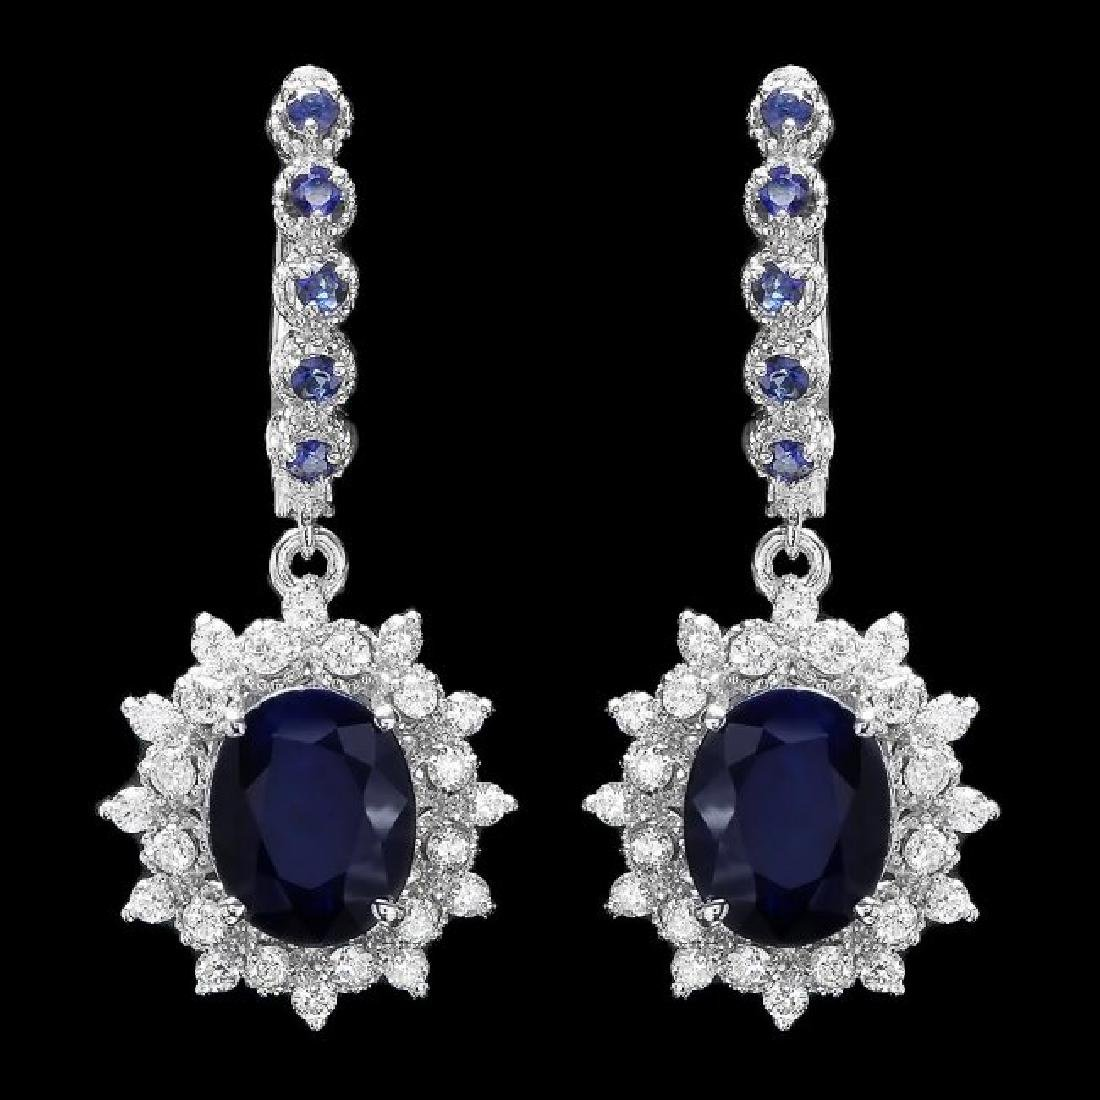 14k Gold 6.4ct Sapphire 1.00ct Diamond Earrings